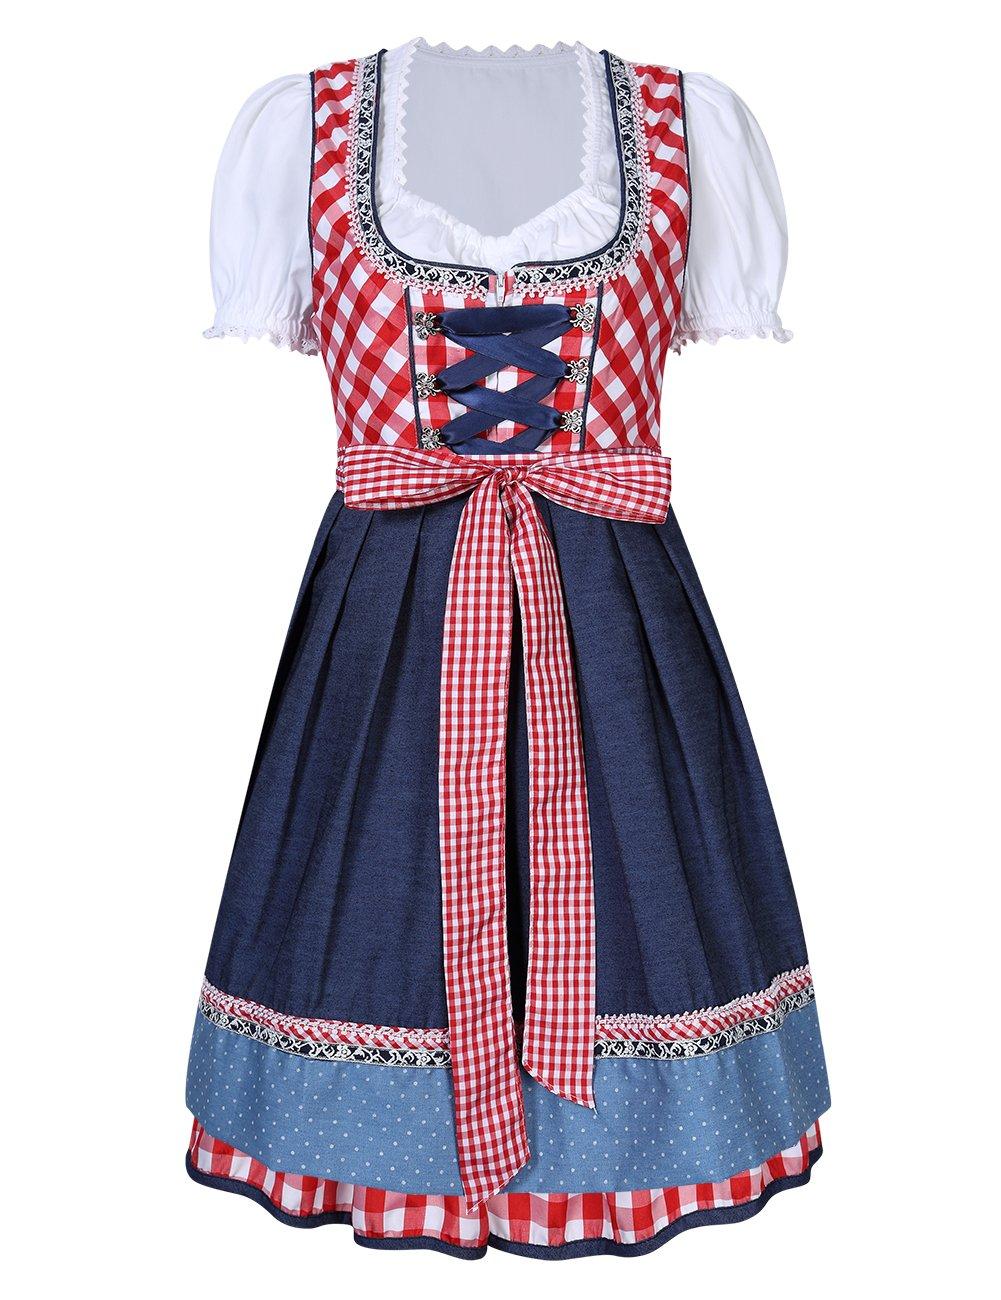 Leoie Kojooin Women's German Dirndl Dress 3 Pieces Oktoberfest Costumes Red Red plaid